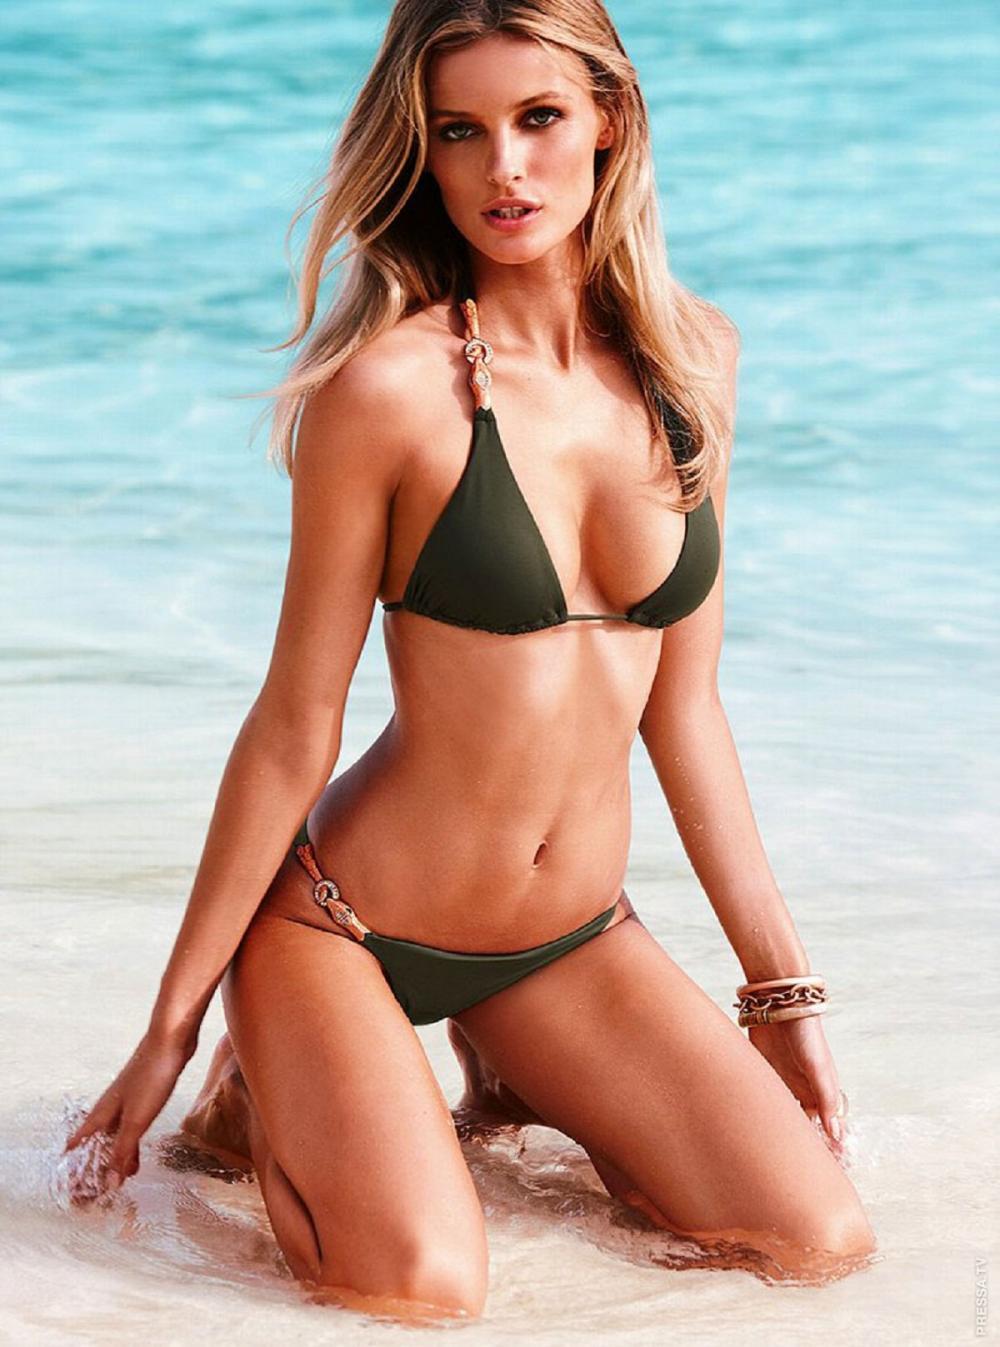 Красивые девушки в купальниках бикини темно зеленого цвета блондинка сидит на коленях на берегу океана